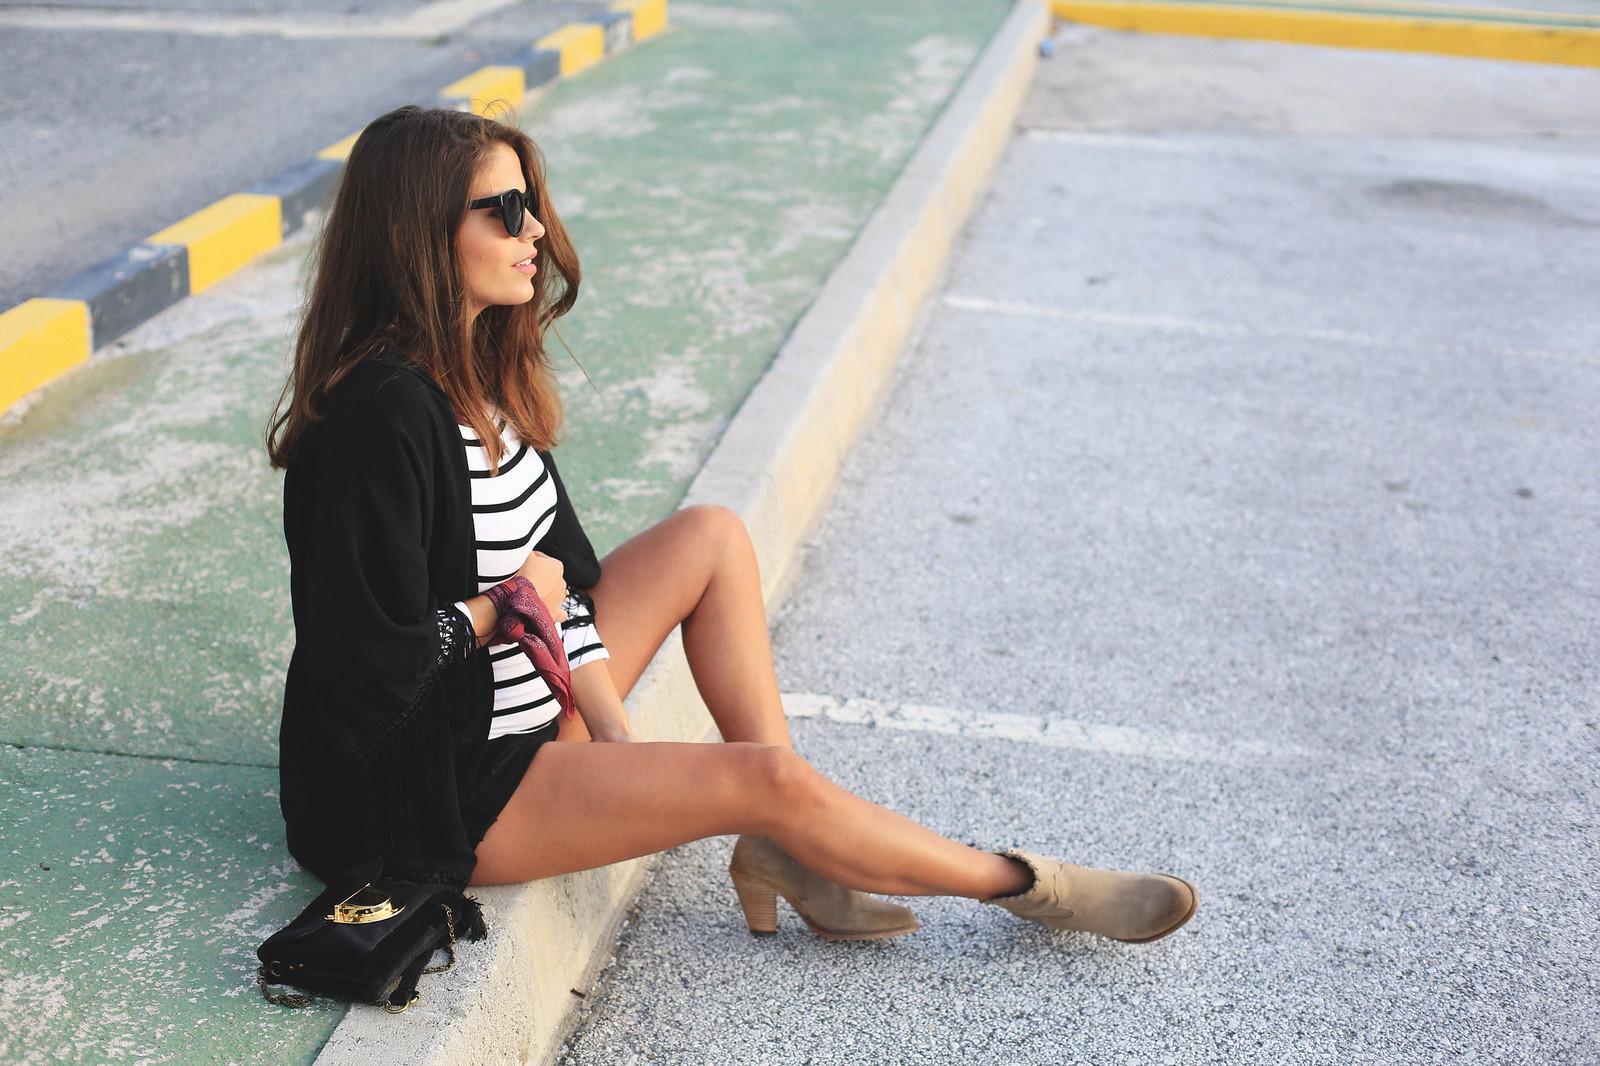 jessie_chanes_black_kimono_striped_top_2